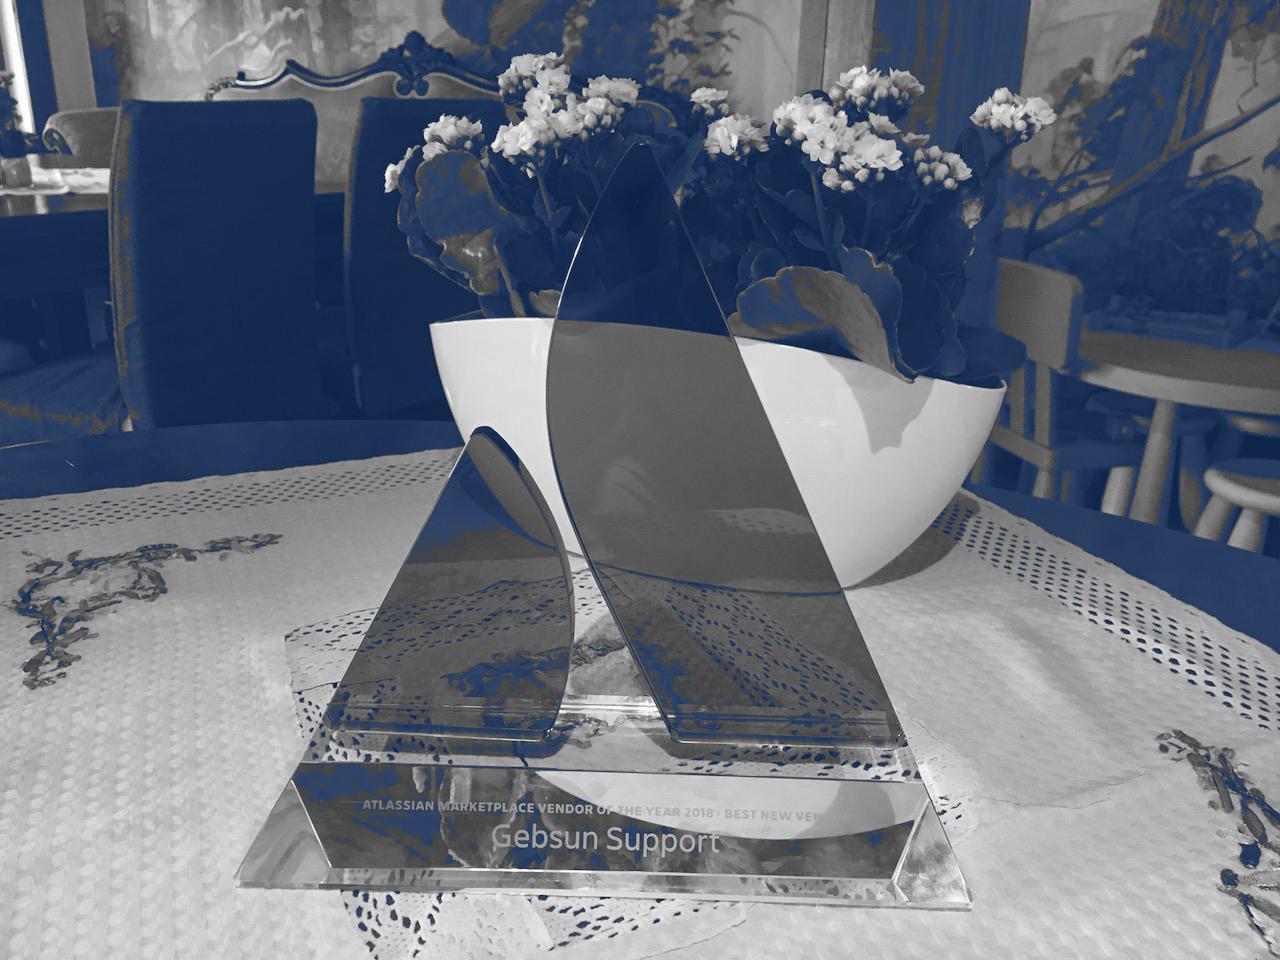 Photo HeroCoders - Gebsun - Atlassian Award